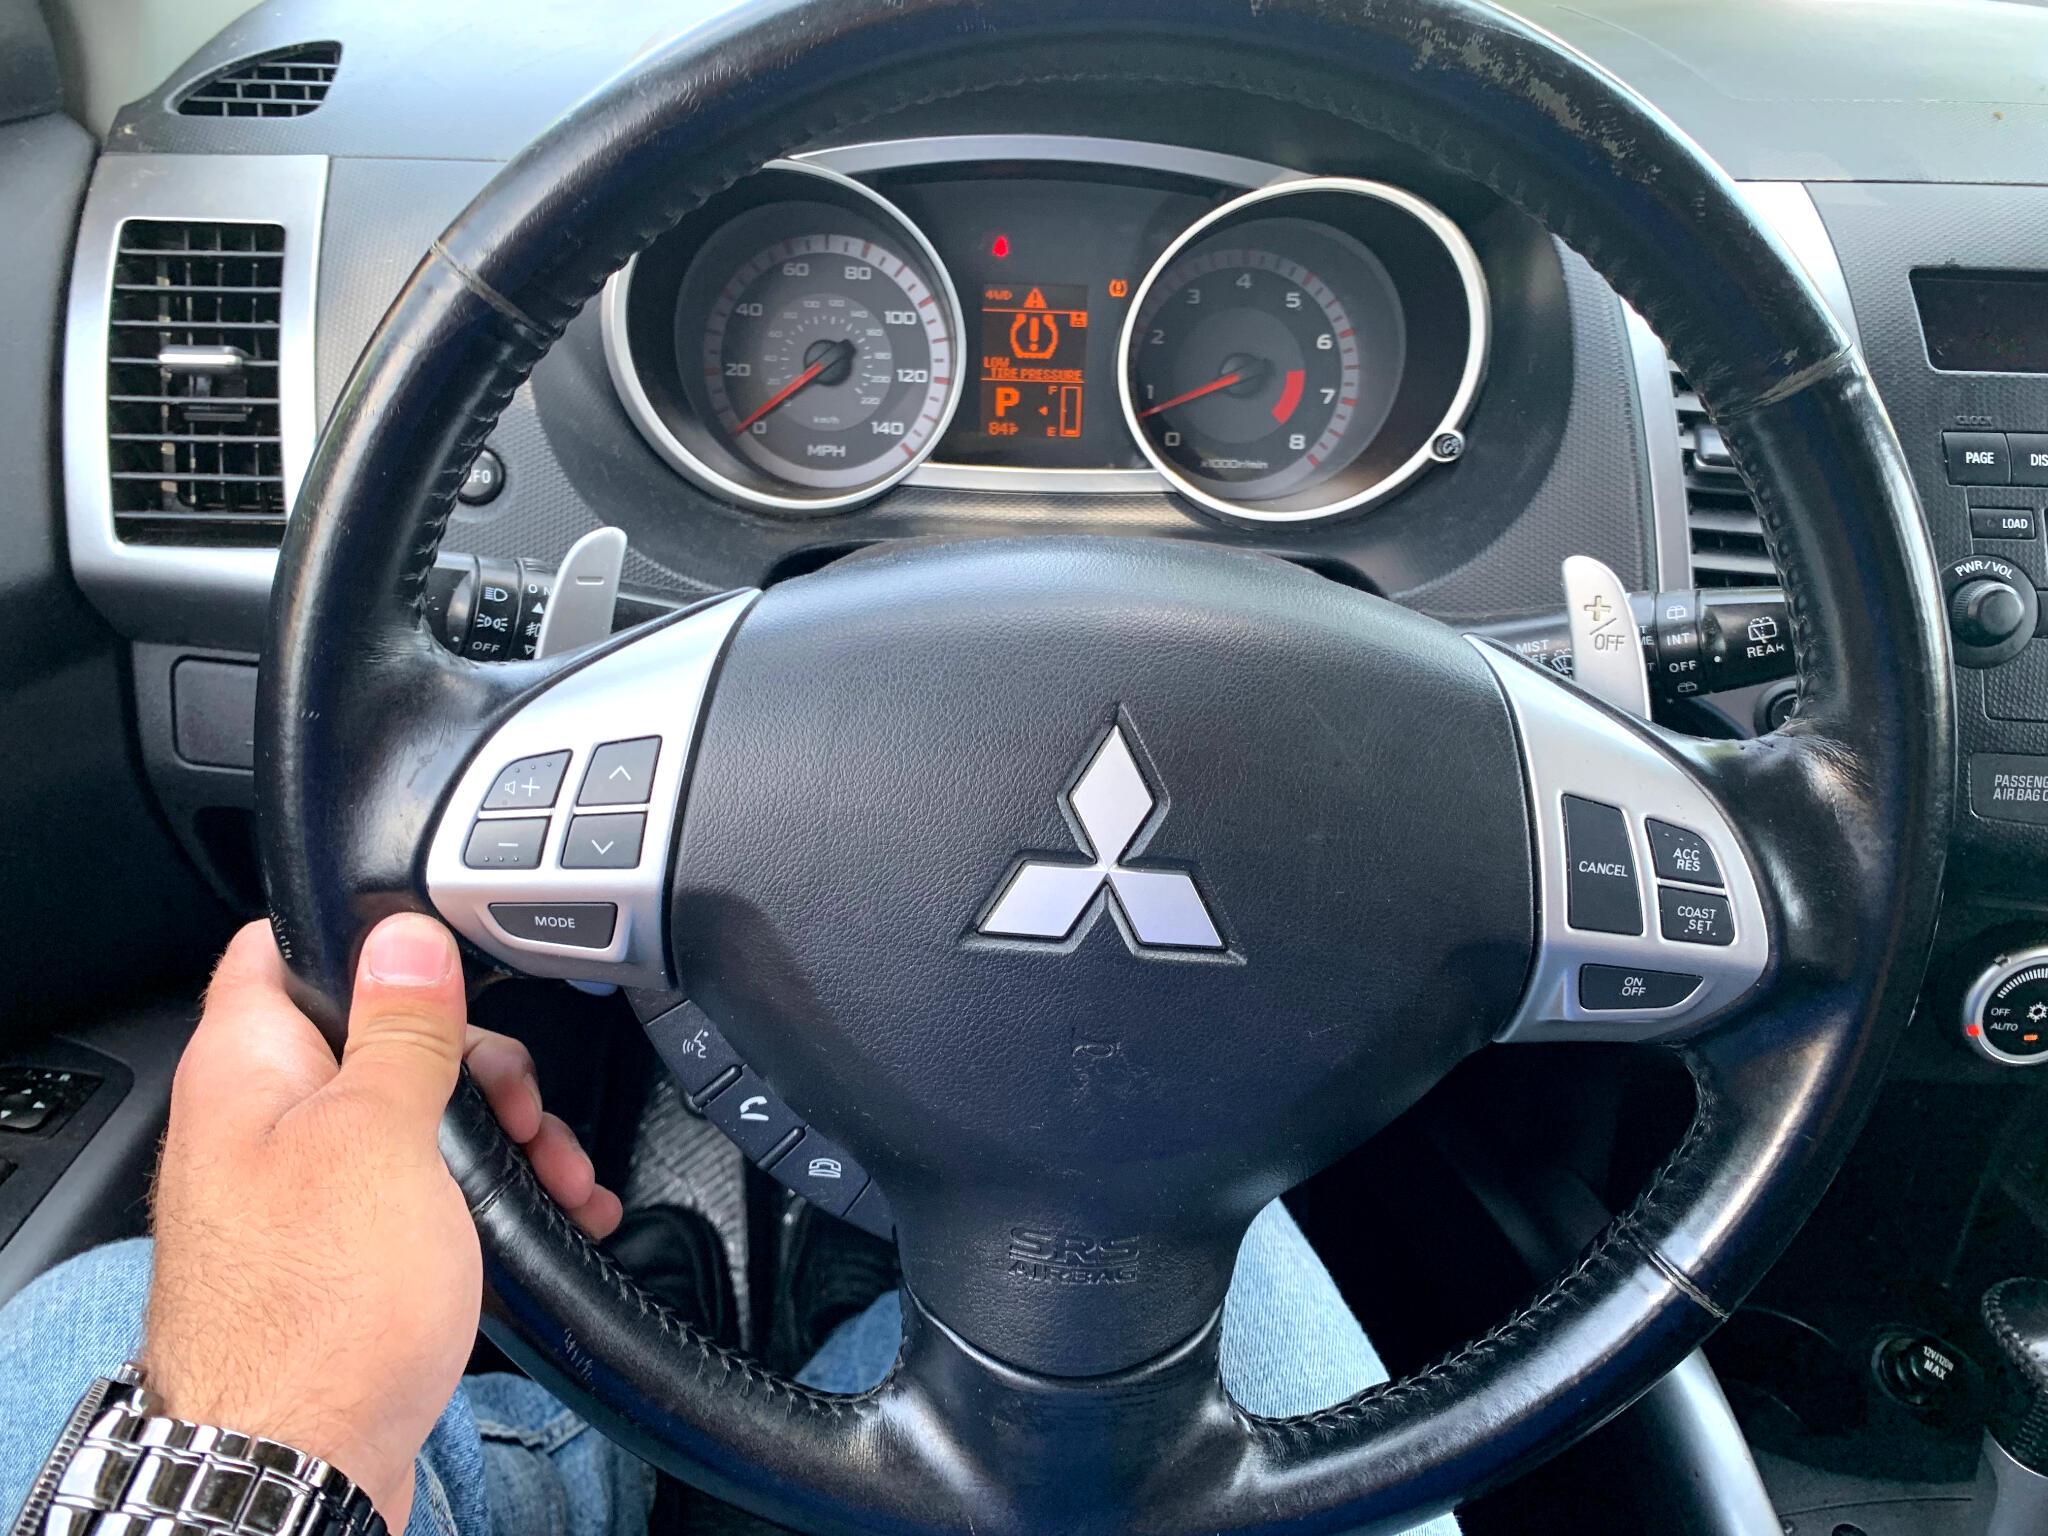 2007 Mitsubishi Outlander AWD 4dr XLS